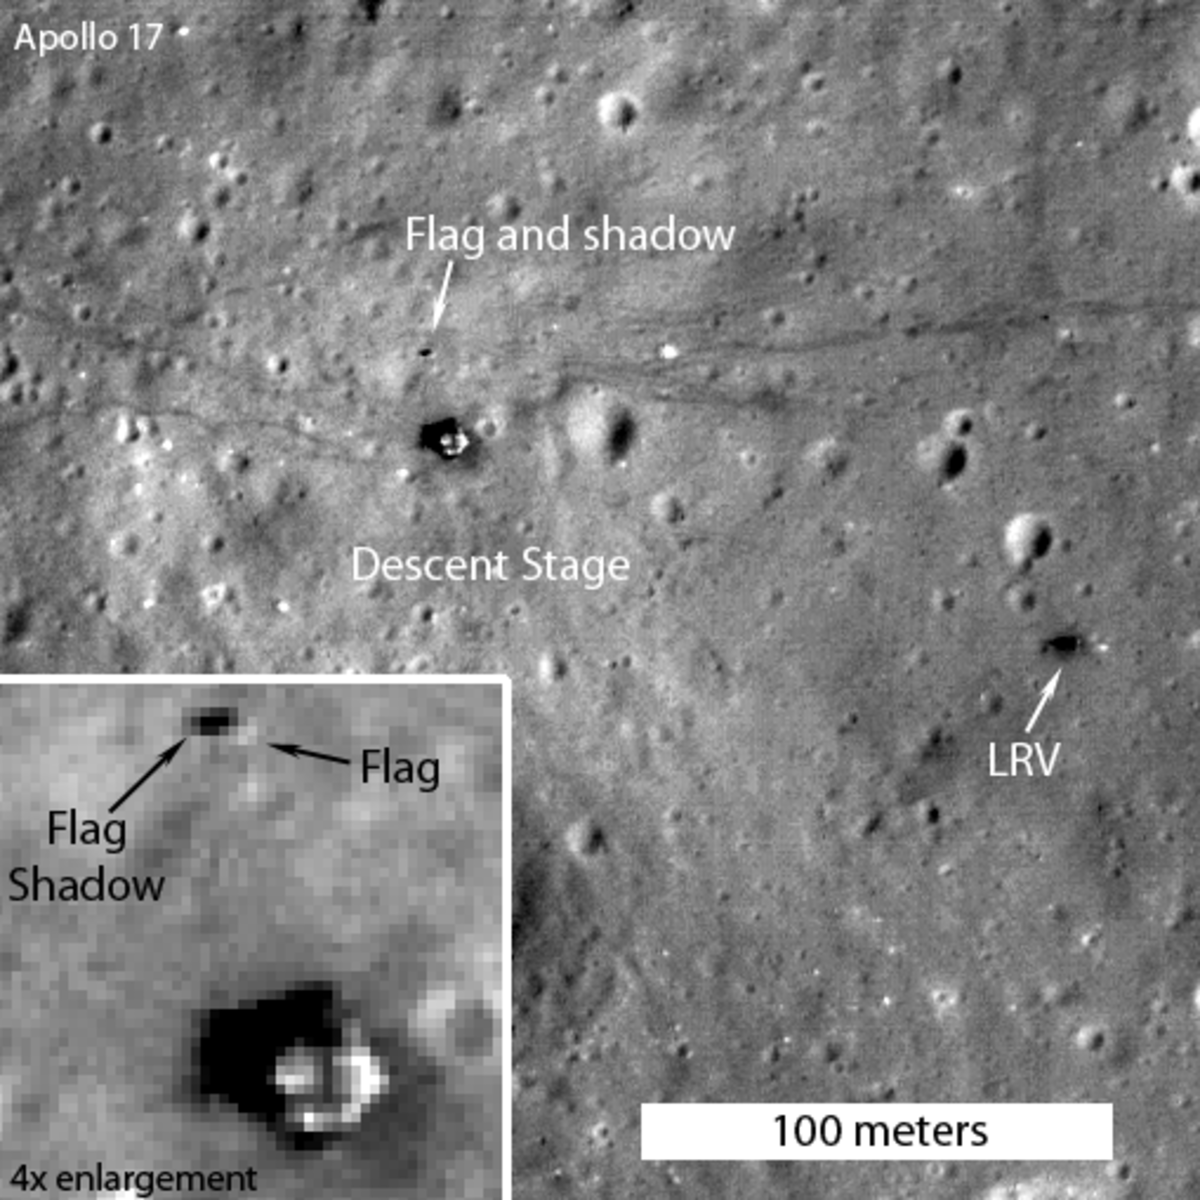 September 2011? Apollo 17 Lander with flag shadow visible.